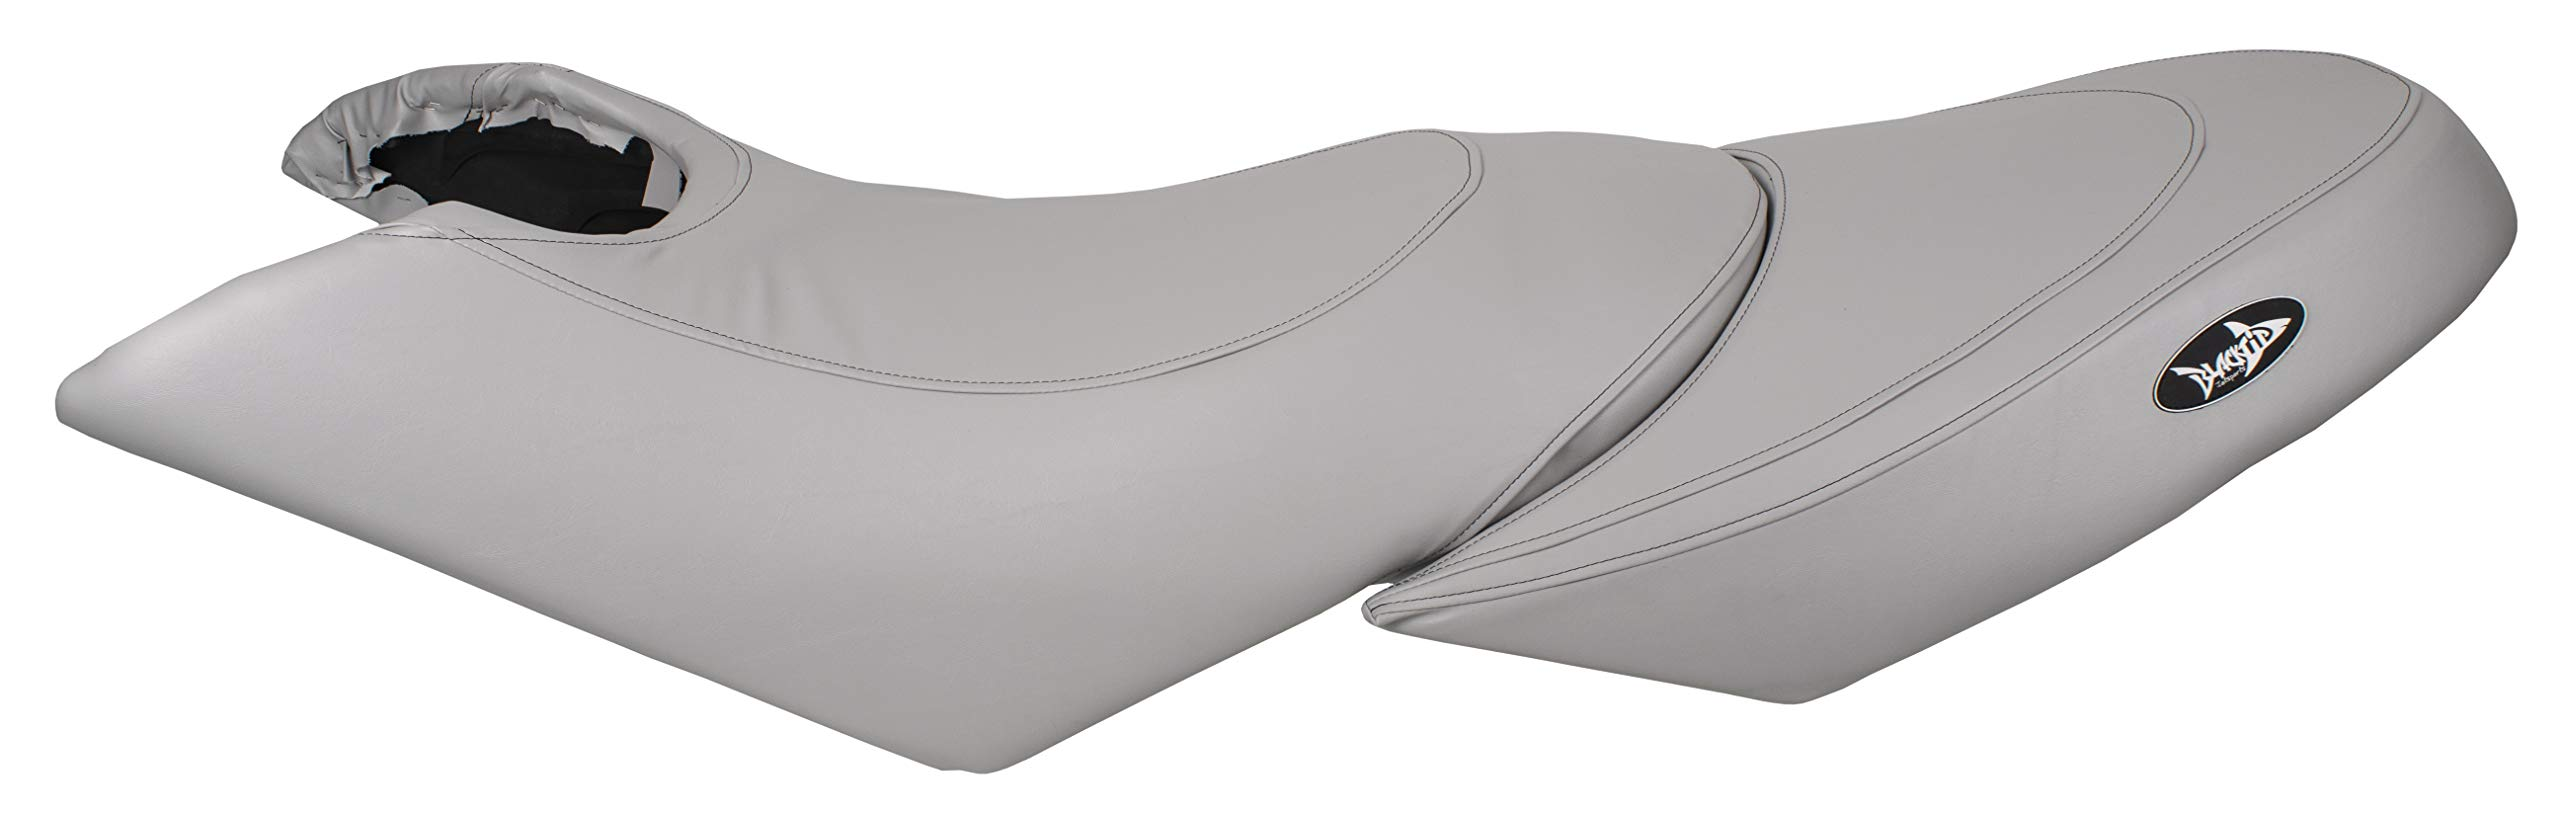 Sea-Doo Seat Cover 02-06 GTX 4-Tec,SC,LTD SC / 05-09 RXT, RXT-X 255/03-08 Wake 155,215/02-03 GTX DI